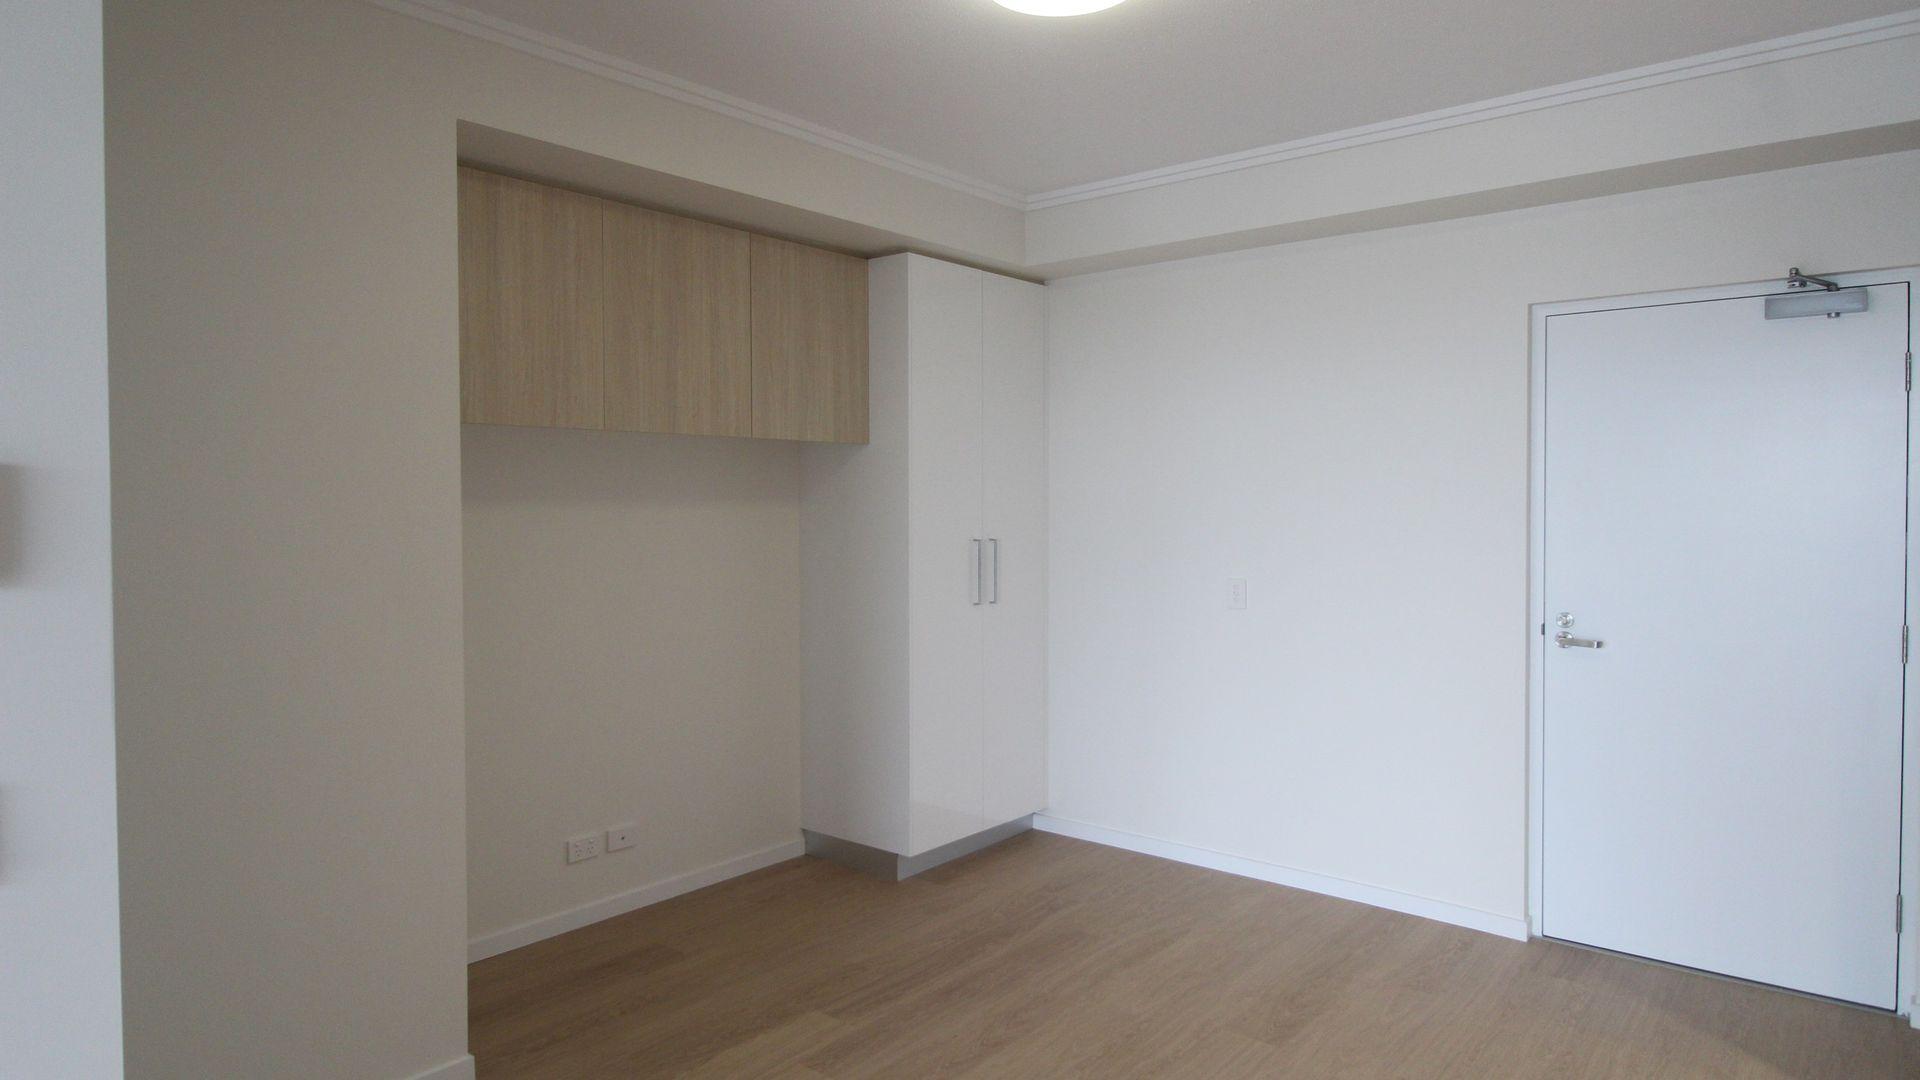 137/25 Parnell Blvd, Robina QLD 4226, Image 1